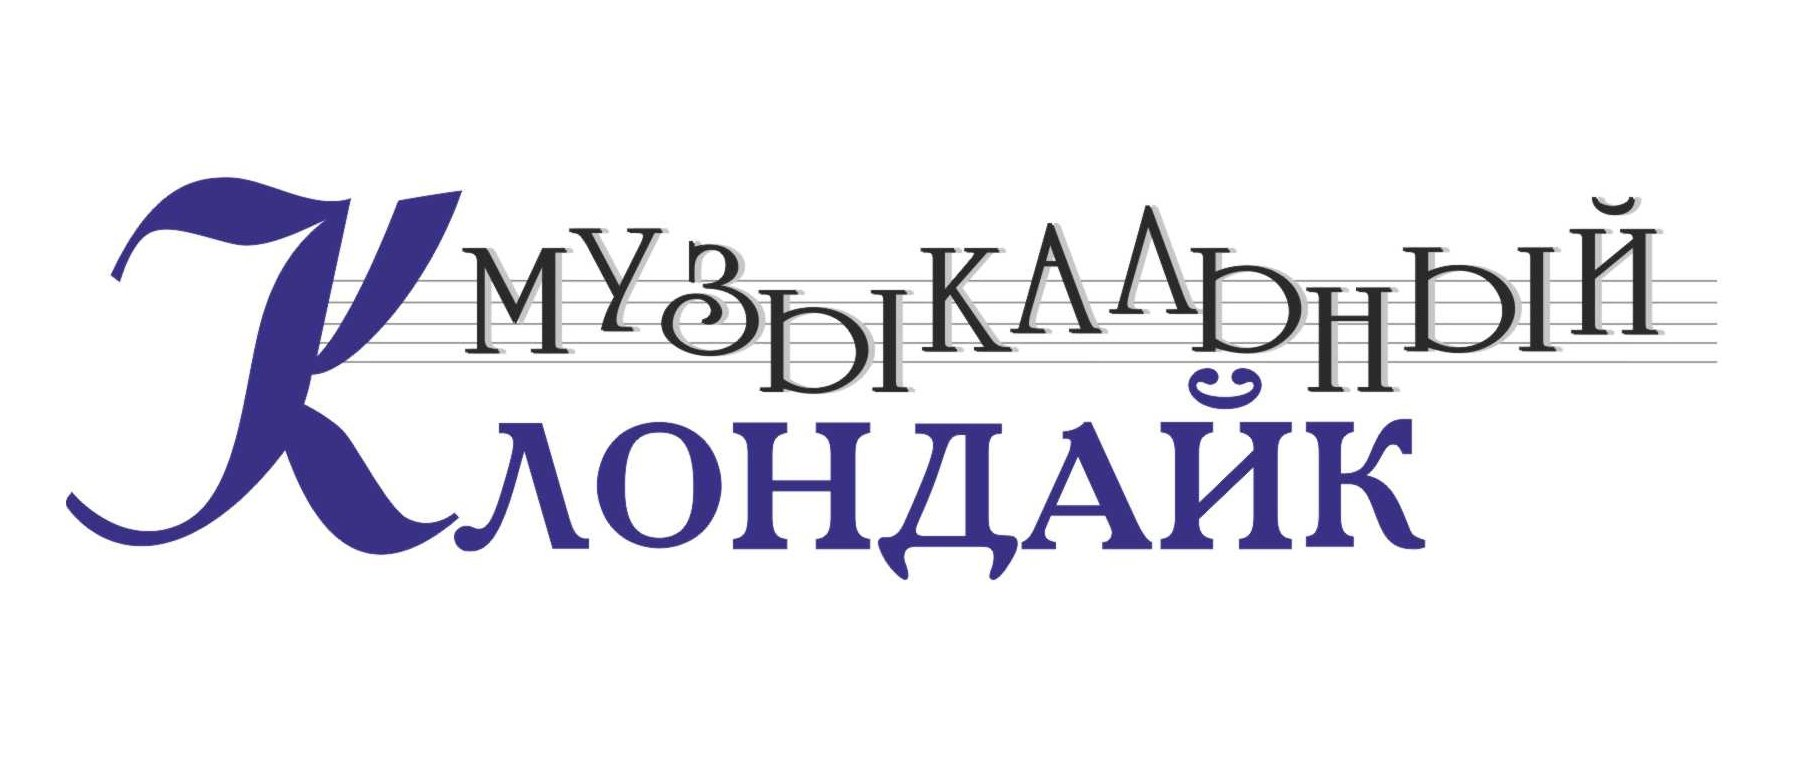 Музыкальный клондайк